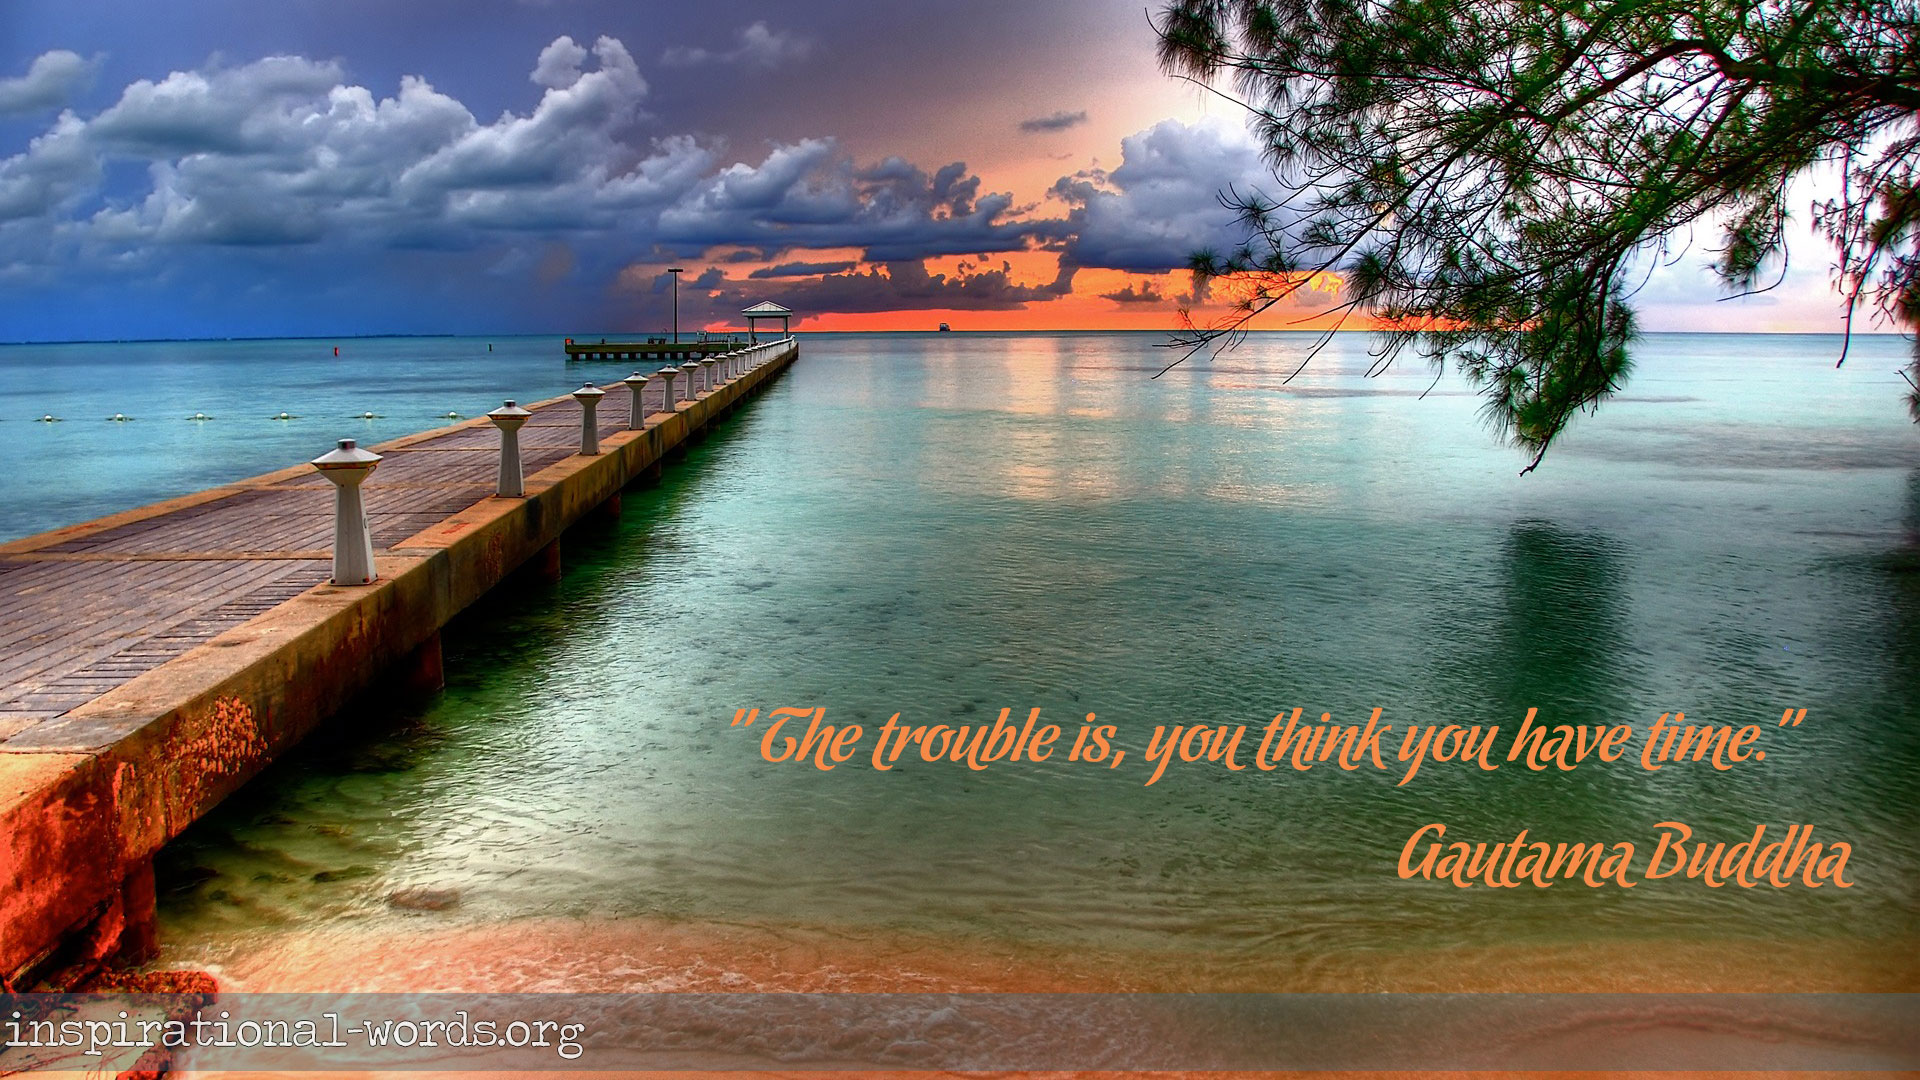 Inspirational Wallpaper Quote by Gautama Buddha